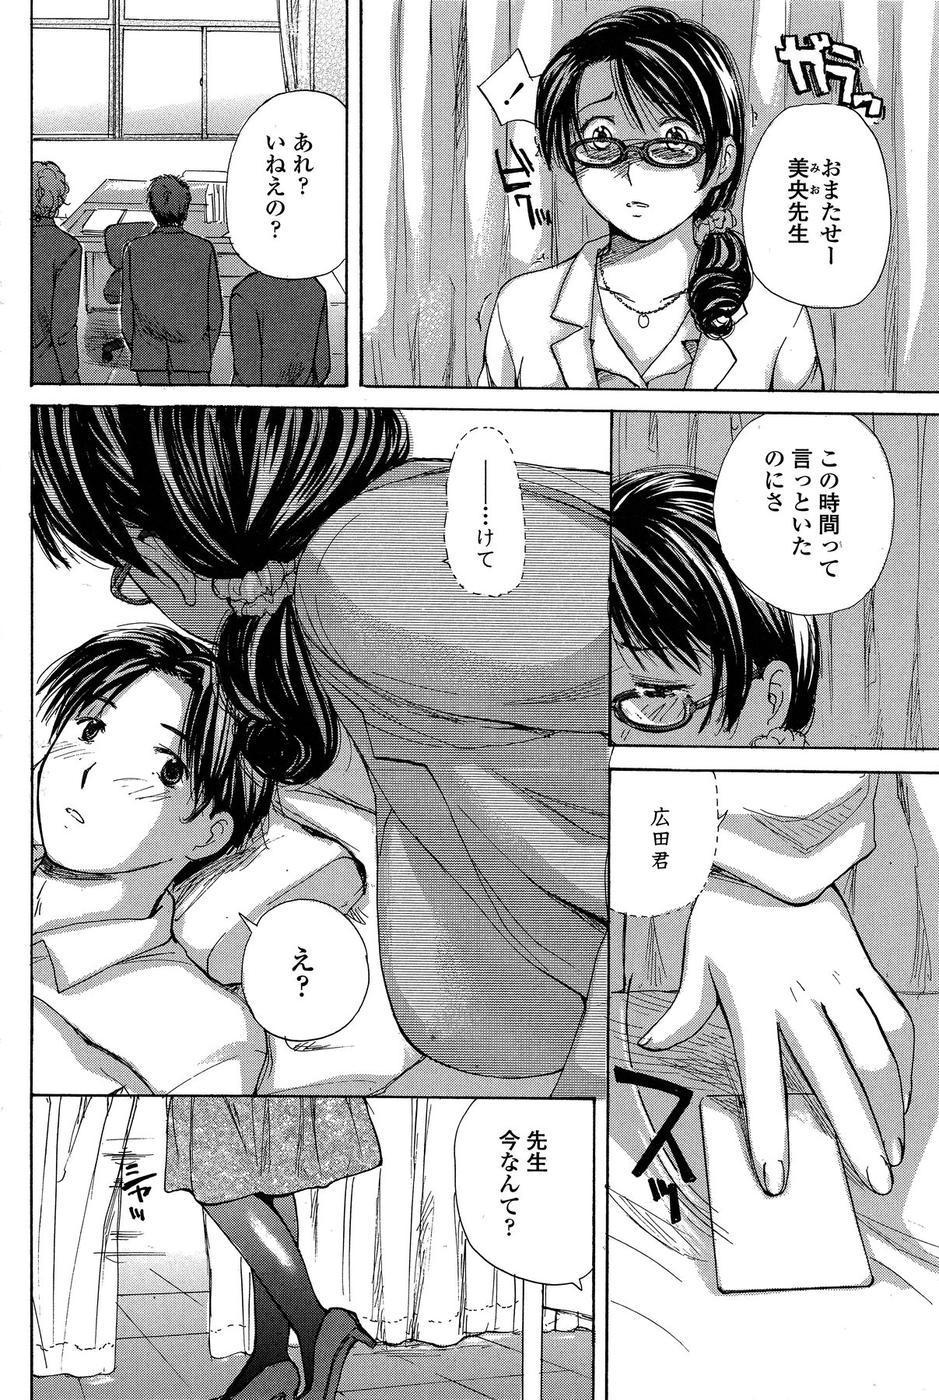 COMIC SIGMA 2009-01 Vol.28 38